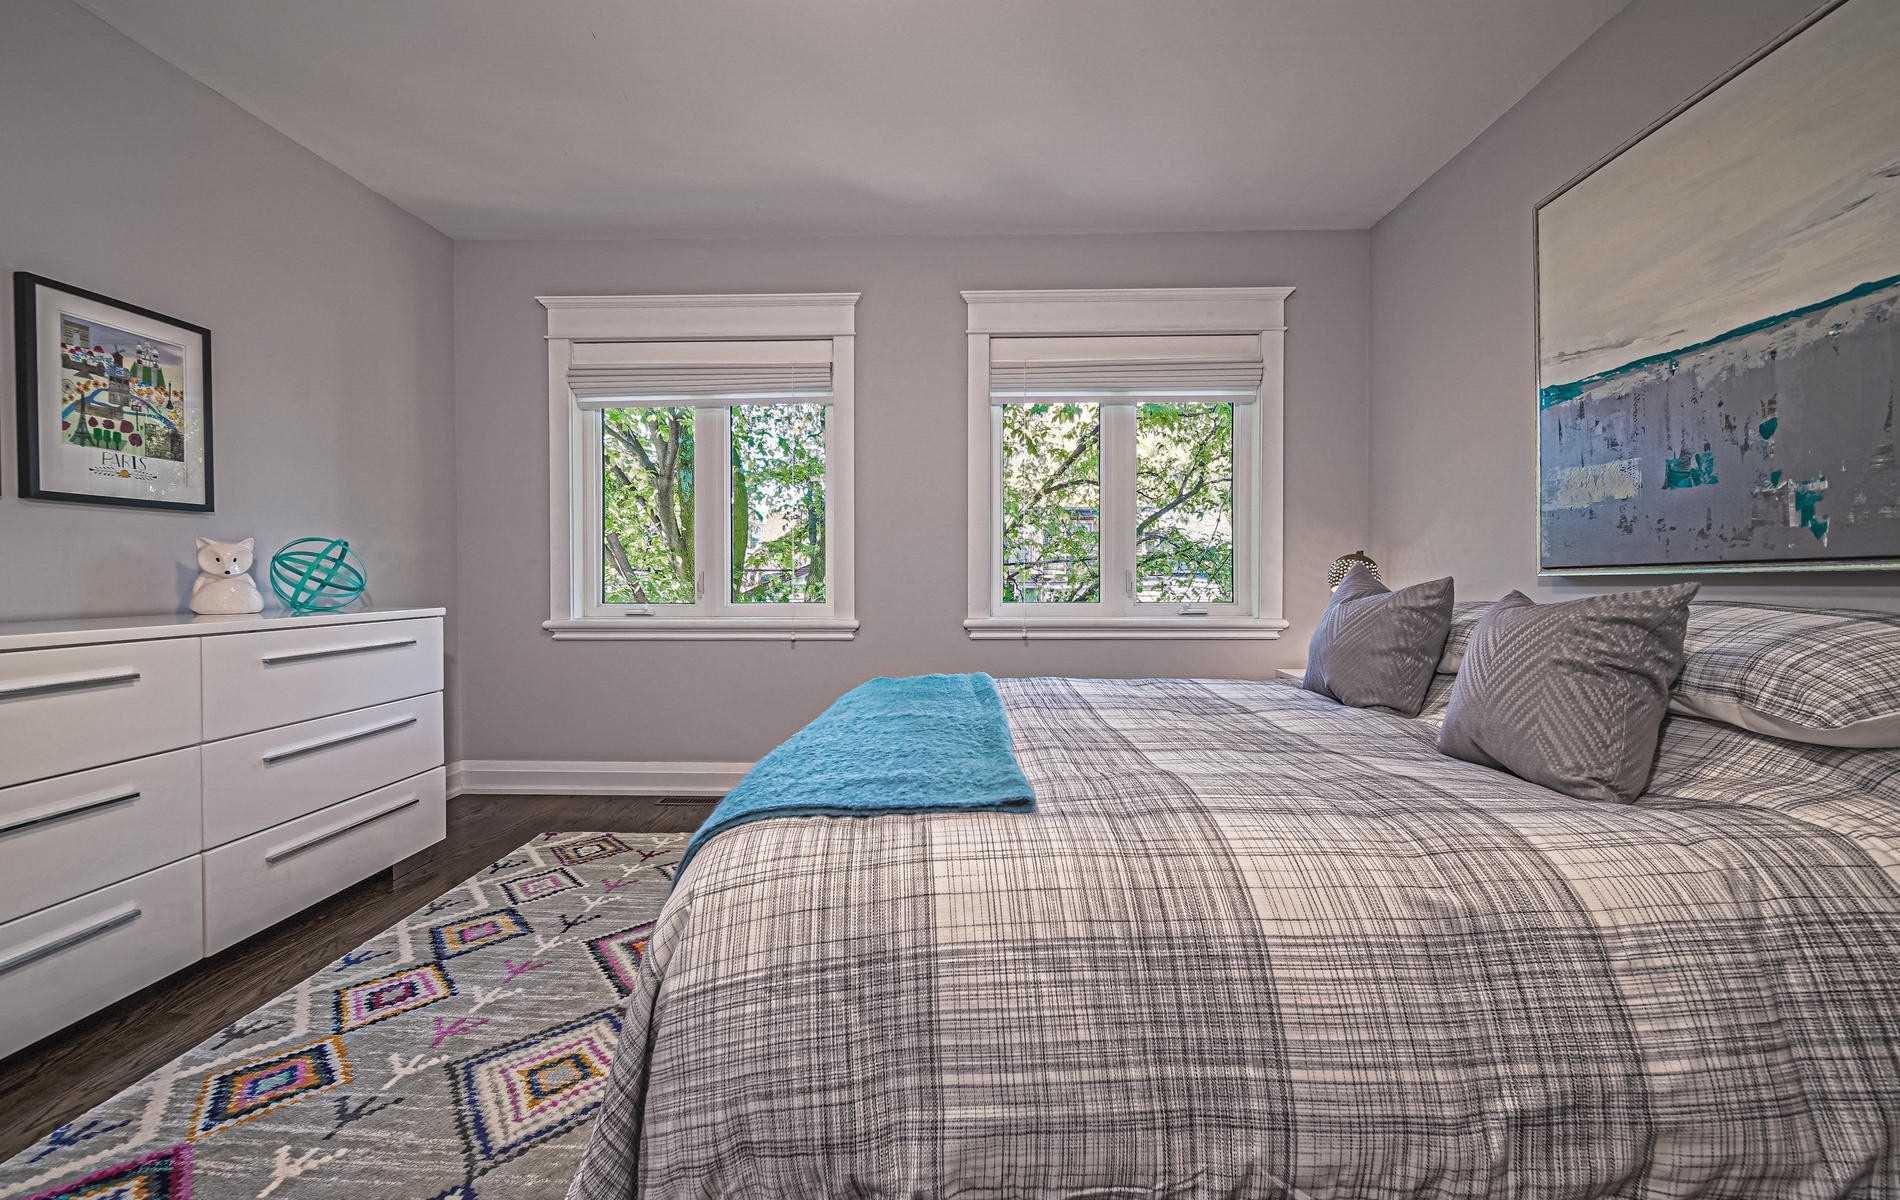 Photo 8: Photos: 216A Hamilton Street in Toronto: South Riverdale House (3-Storey) for sale (Toronto E01)  : MLS®# E4619870